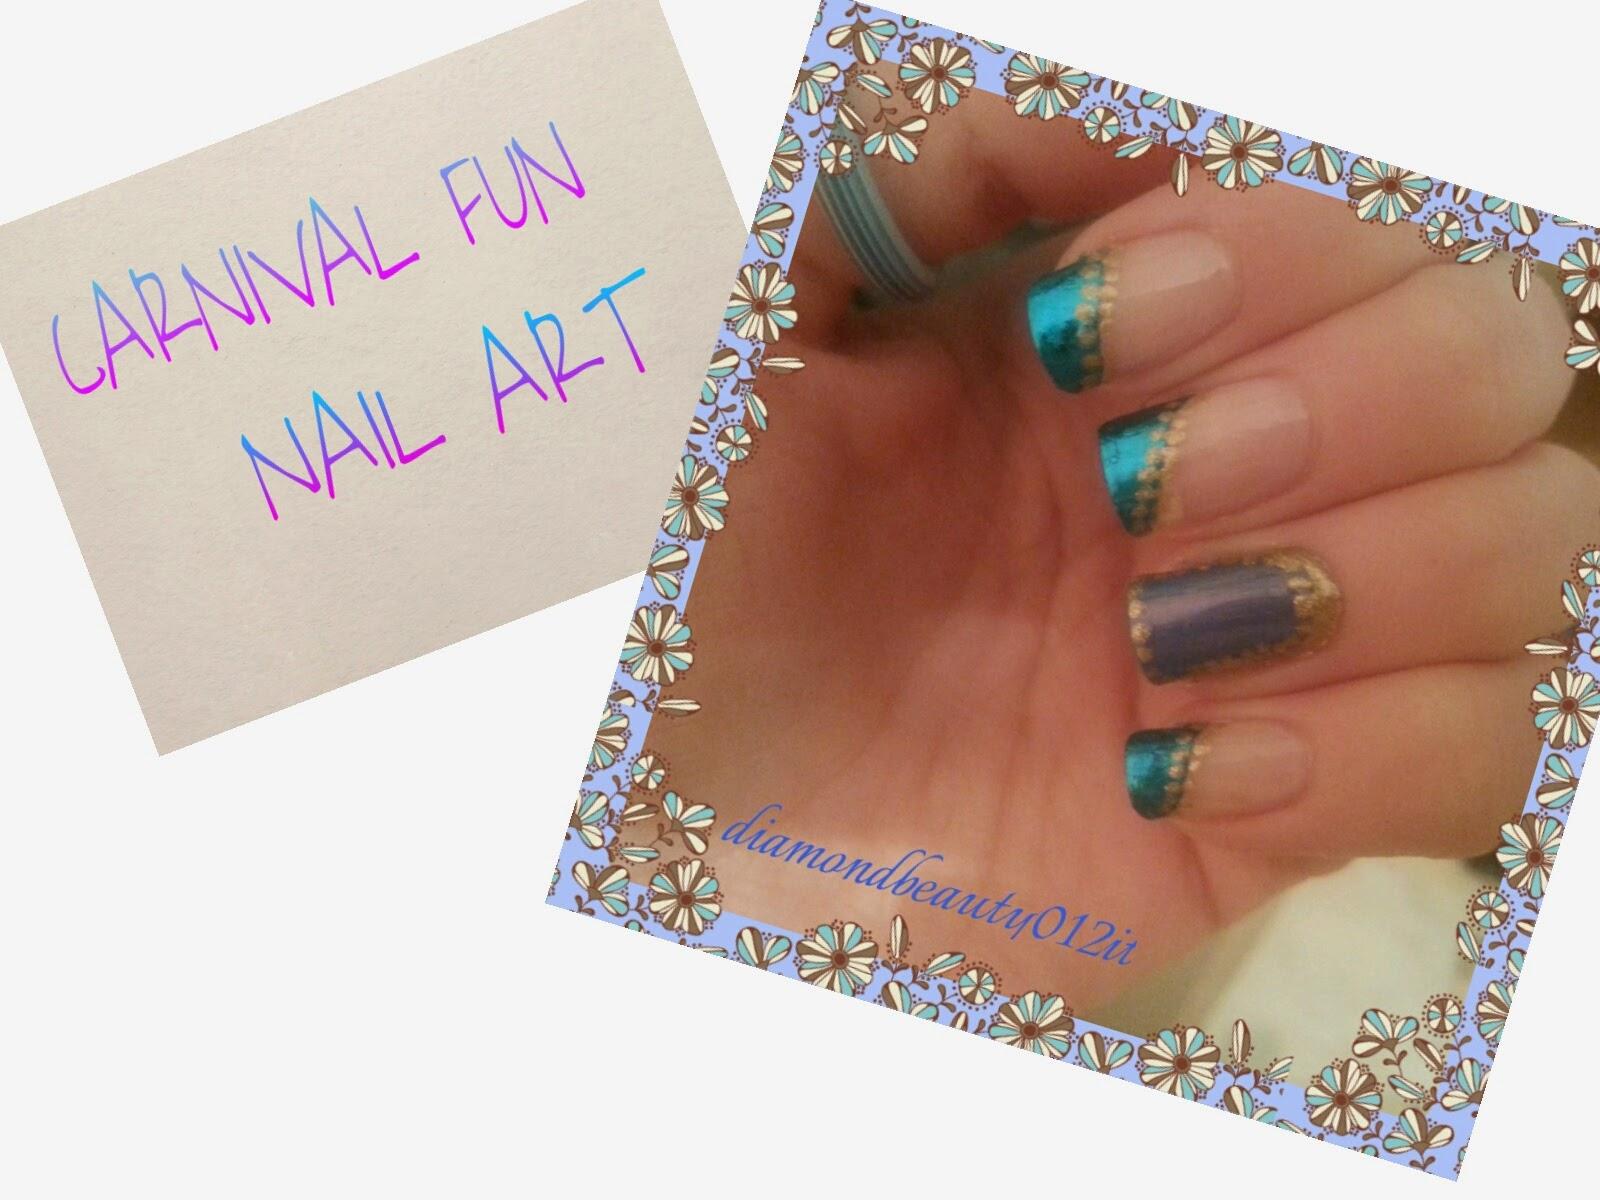 nail art per il carnevale